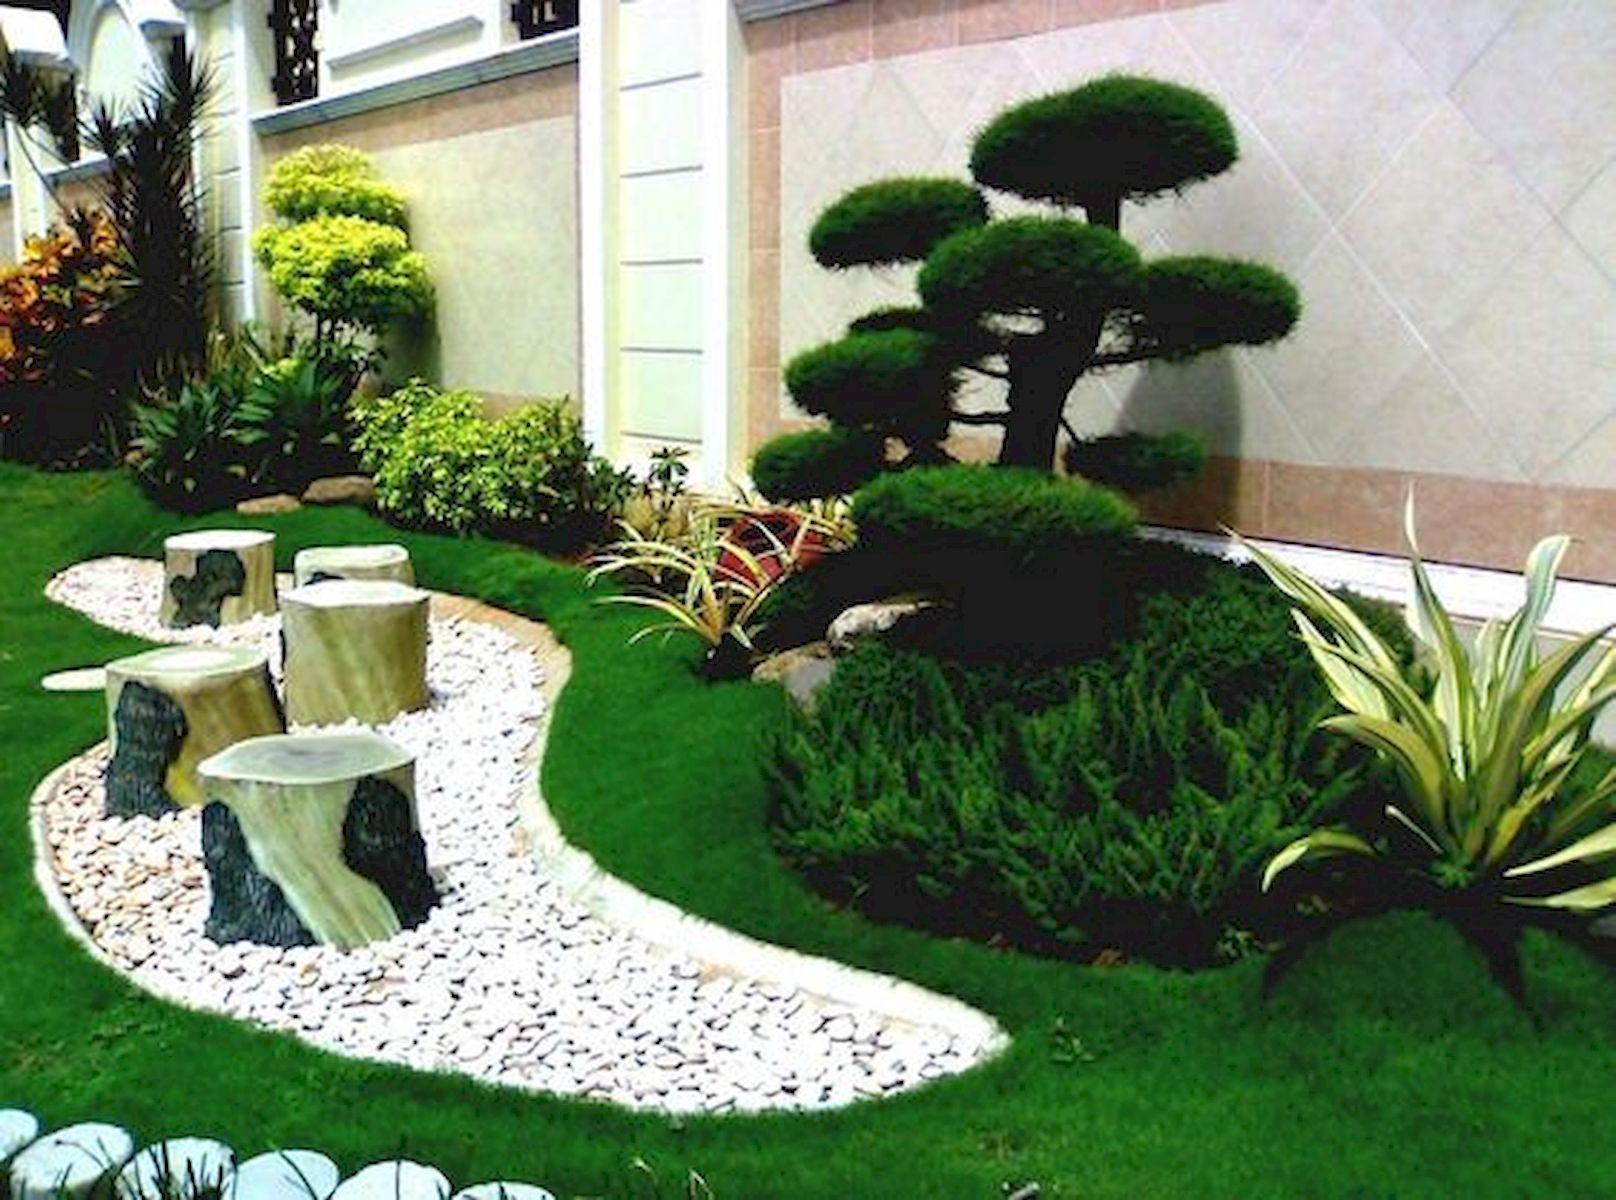 Pin By Mandy P On Gardening Backyard Landscaping Designs Home Landscaping Backyard Landscaping